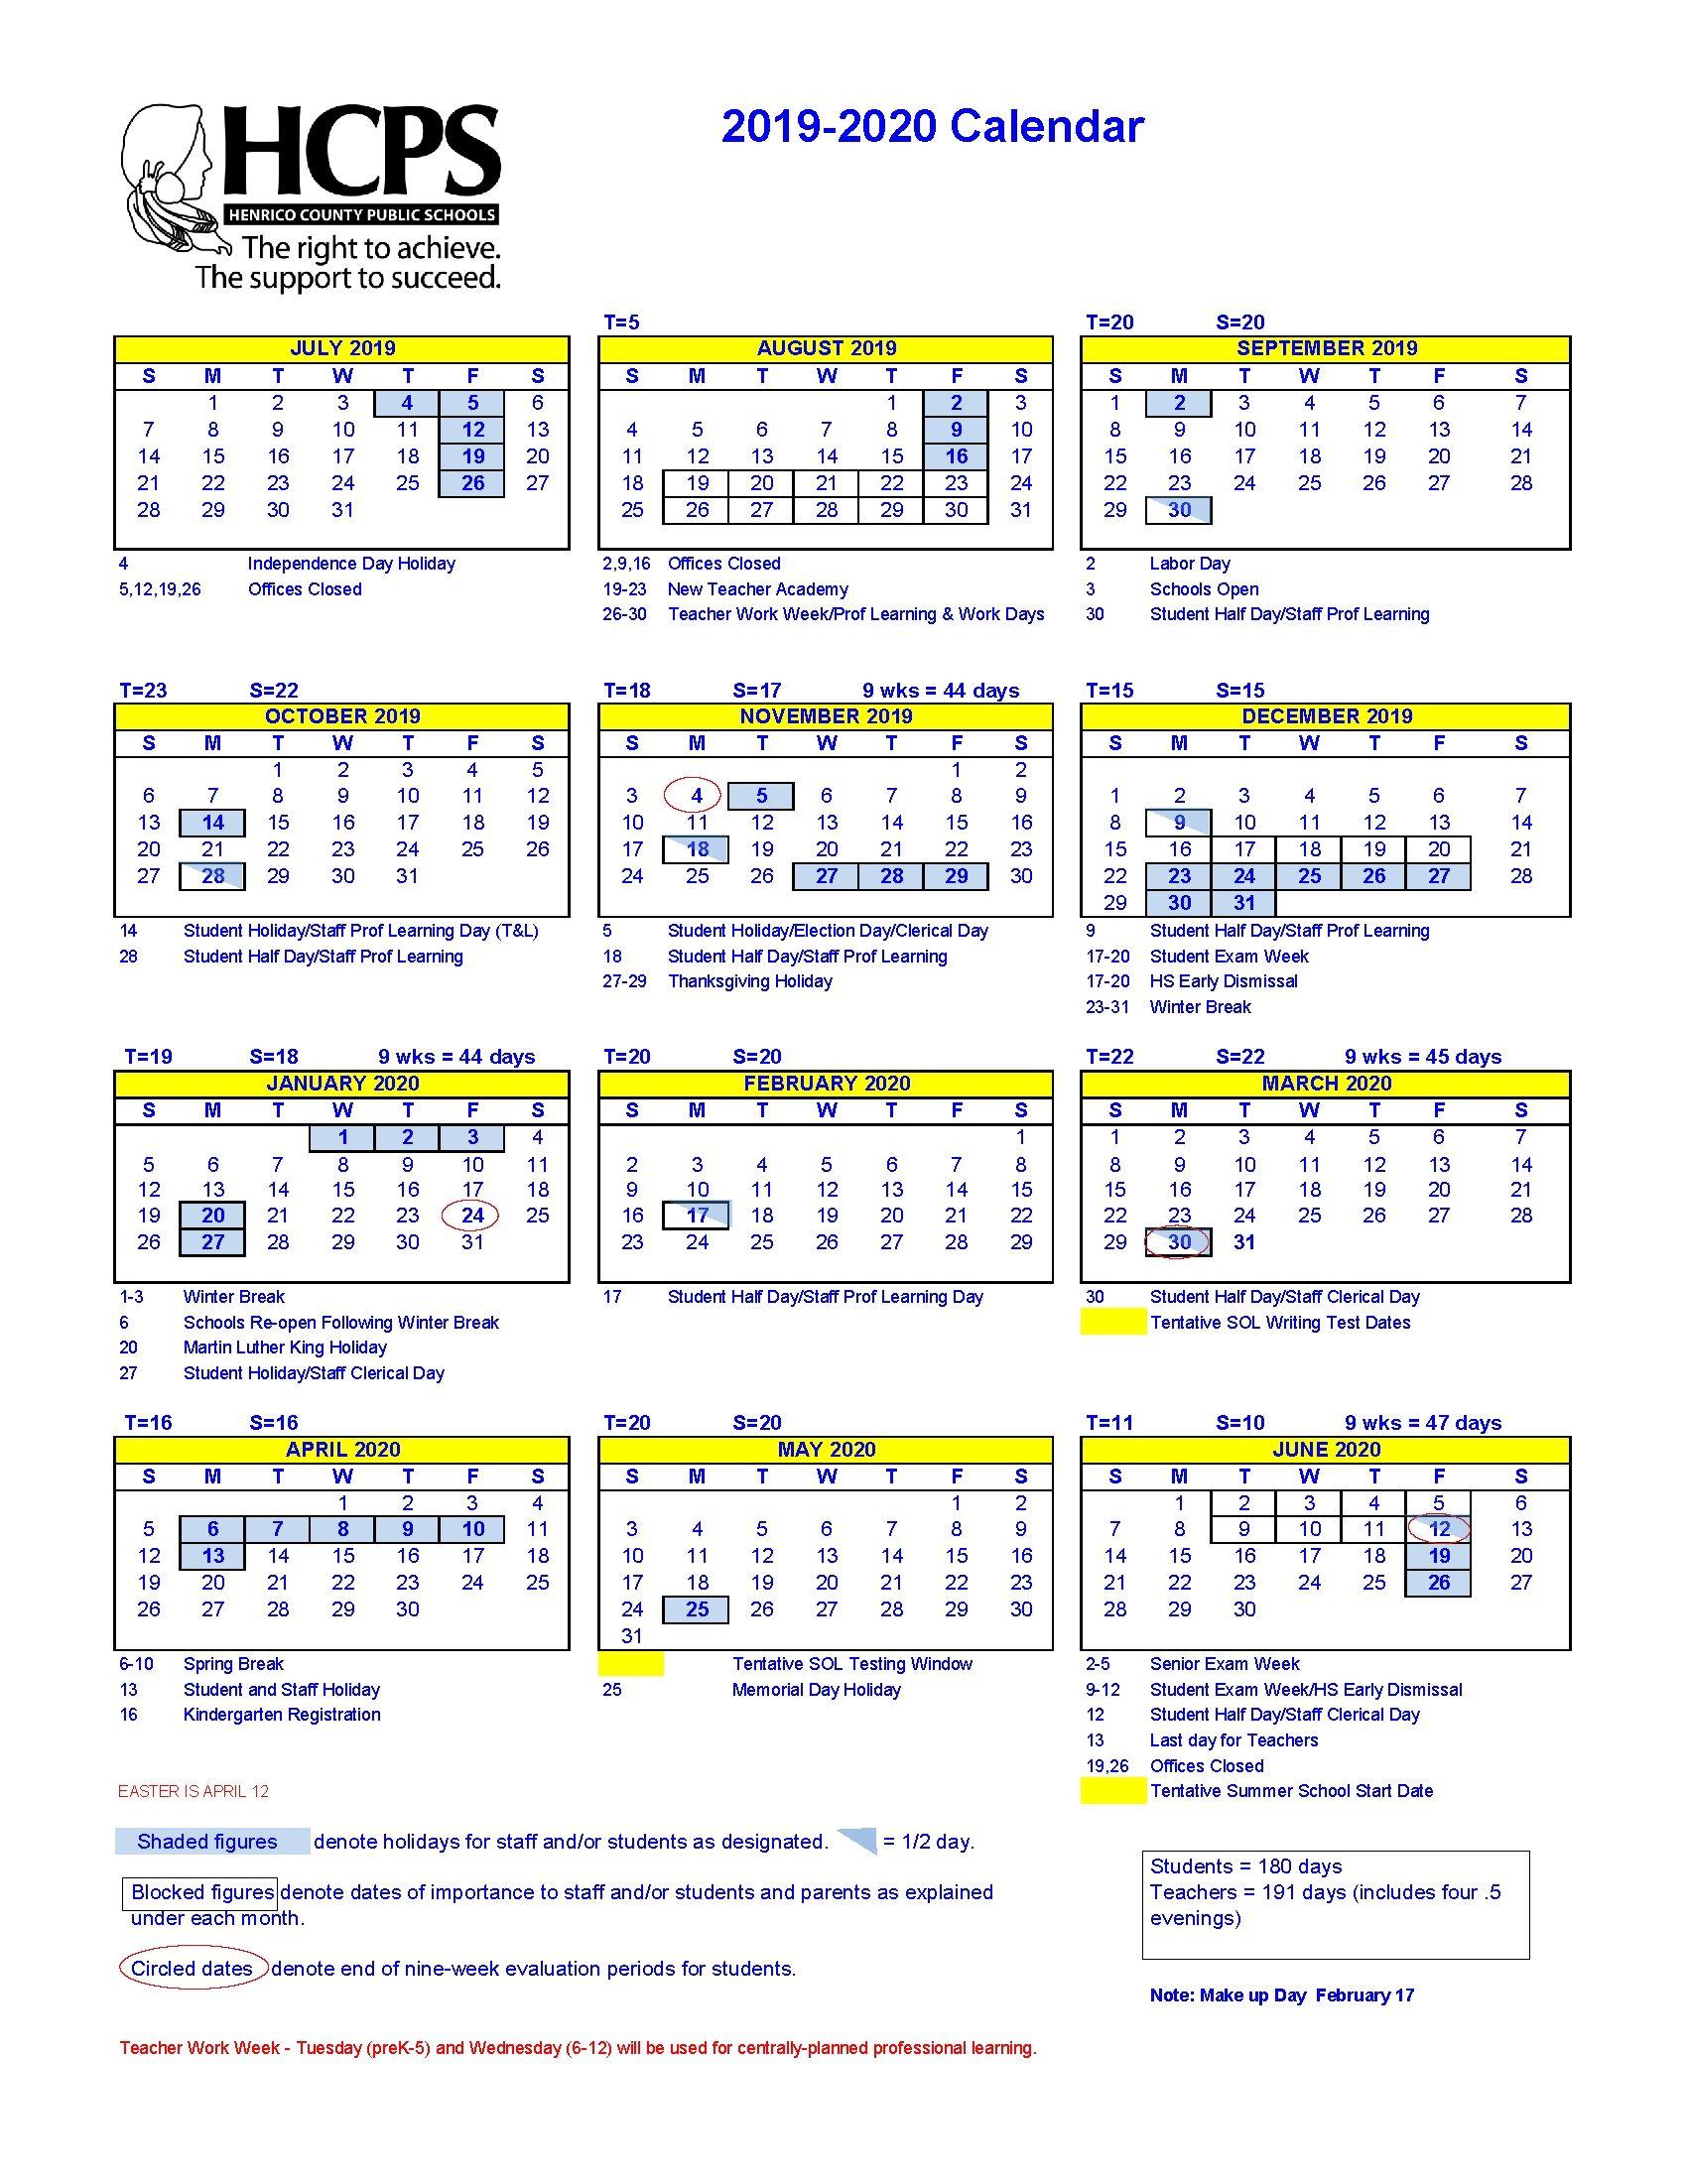 Martin County School Calendar 2021-2022 Remarkable School Calendar Martin County | School calendar